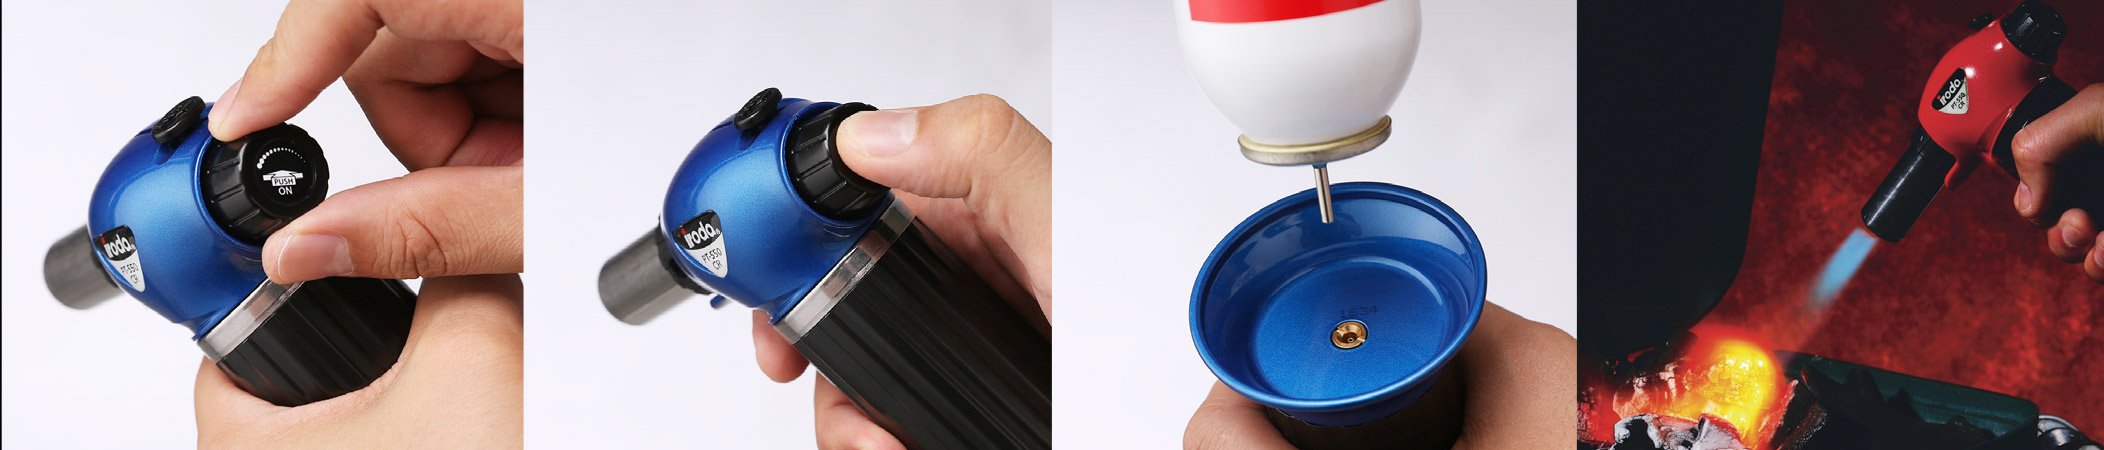 Pro Iroda-Tools PT-550CR puhalluslamppu, kaasupoltin, pikkutoho, käsitoho